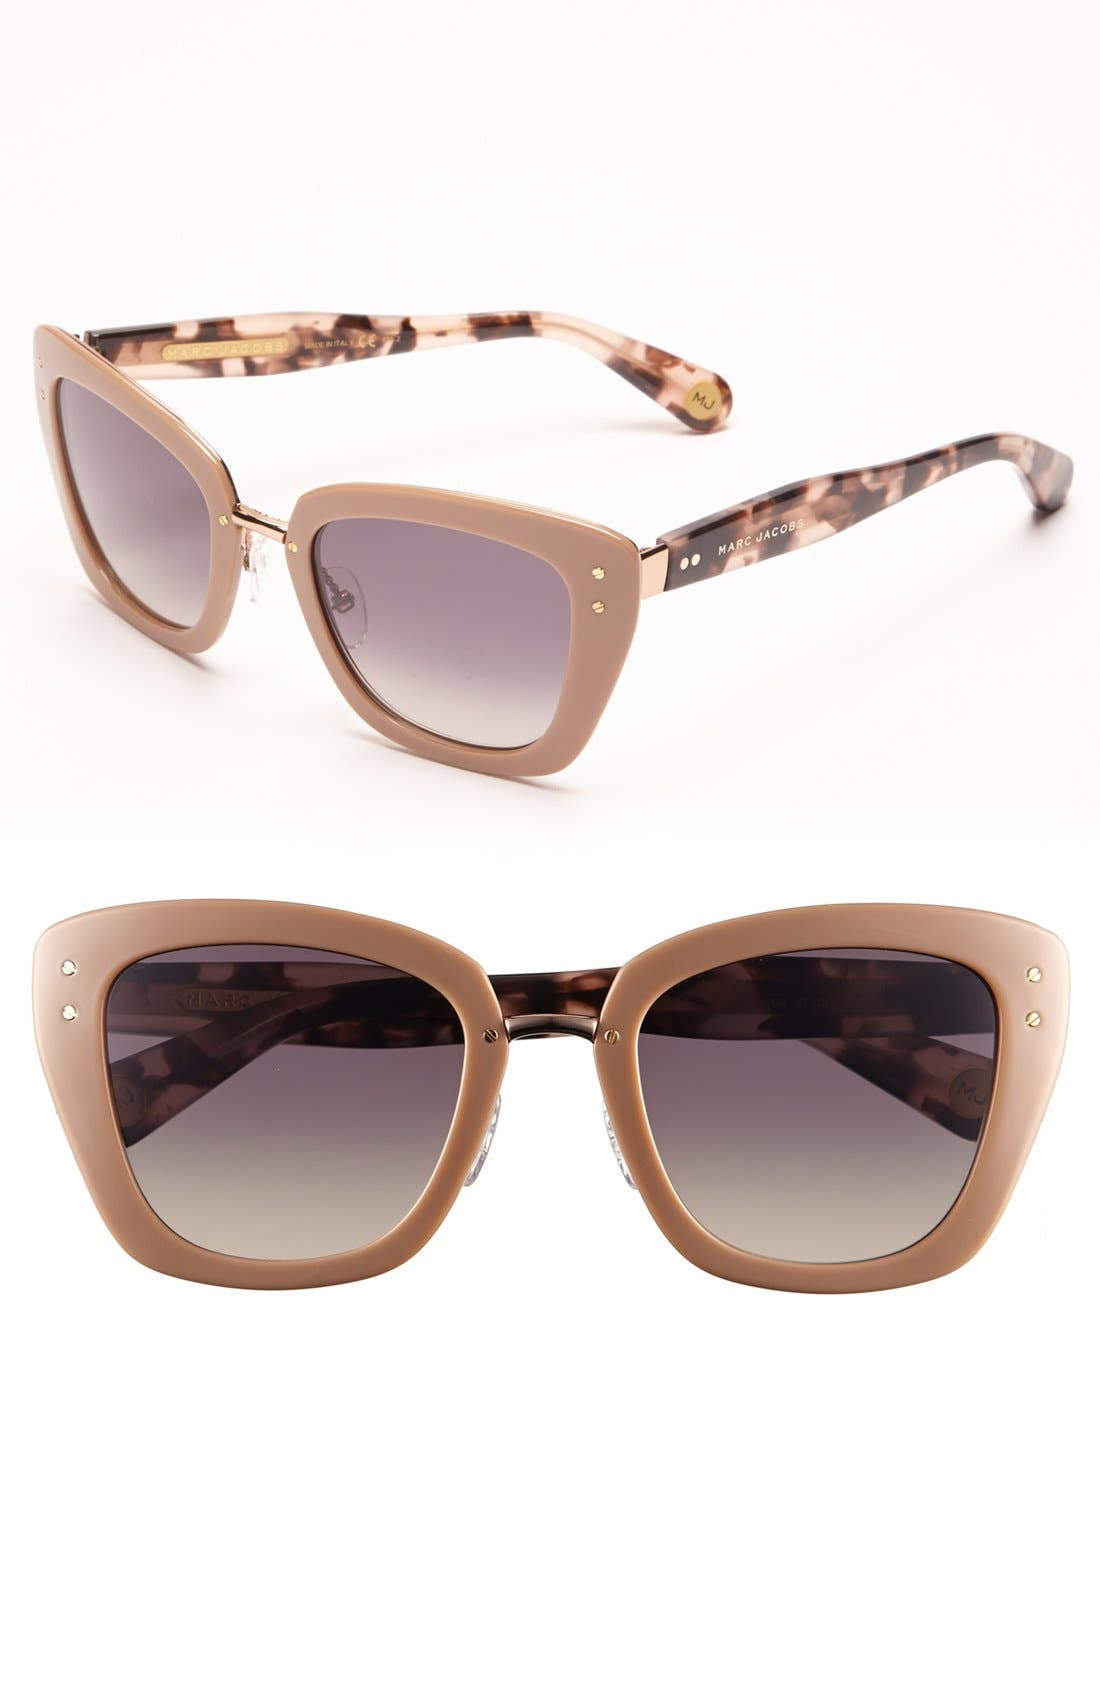 Alternate Image 1 Selected - Marc Jacobs 53mm Retro Sunglasses